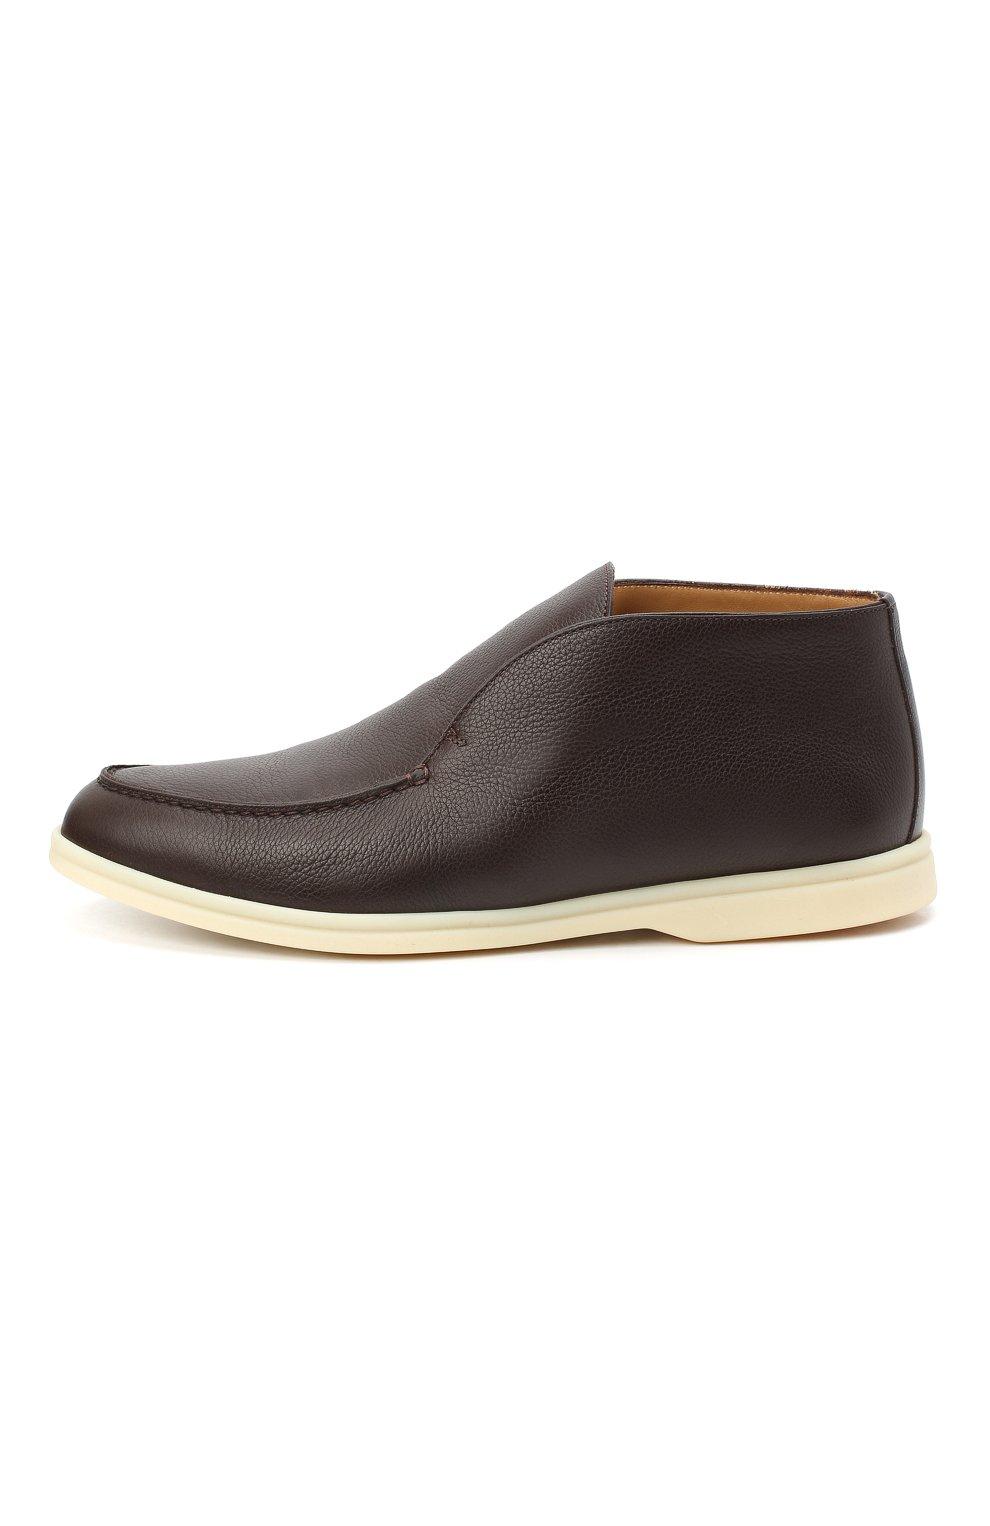 Мужские кожаные ботинки open walk LORO PIANA темно-коричневого цвета, арт. FAL0319 | Фото 3